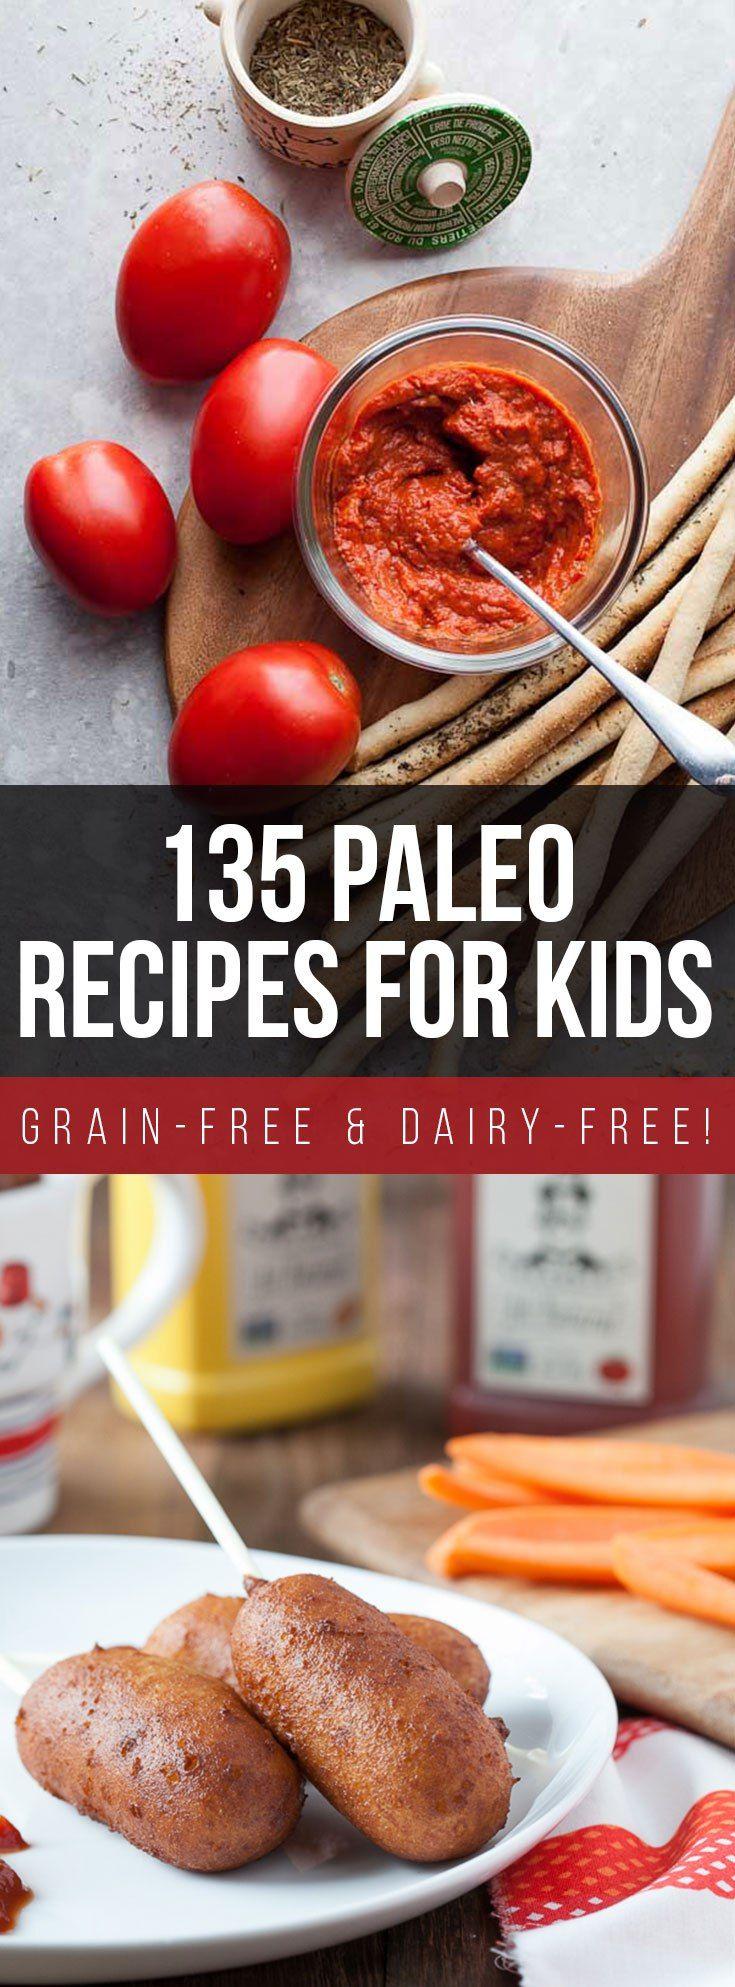 135 Paleo Recipes For Kids